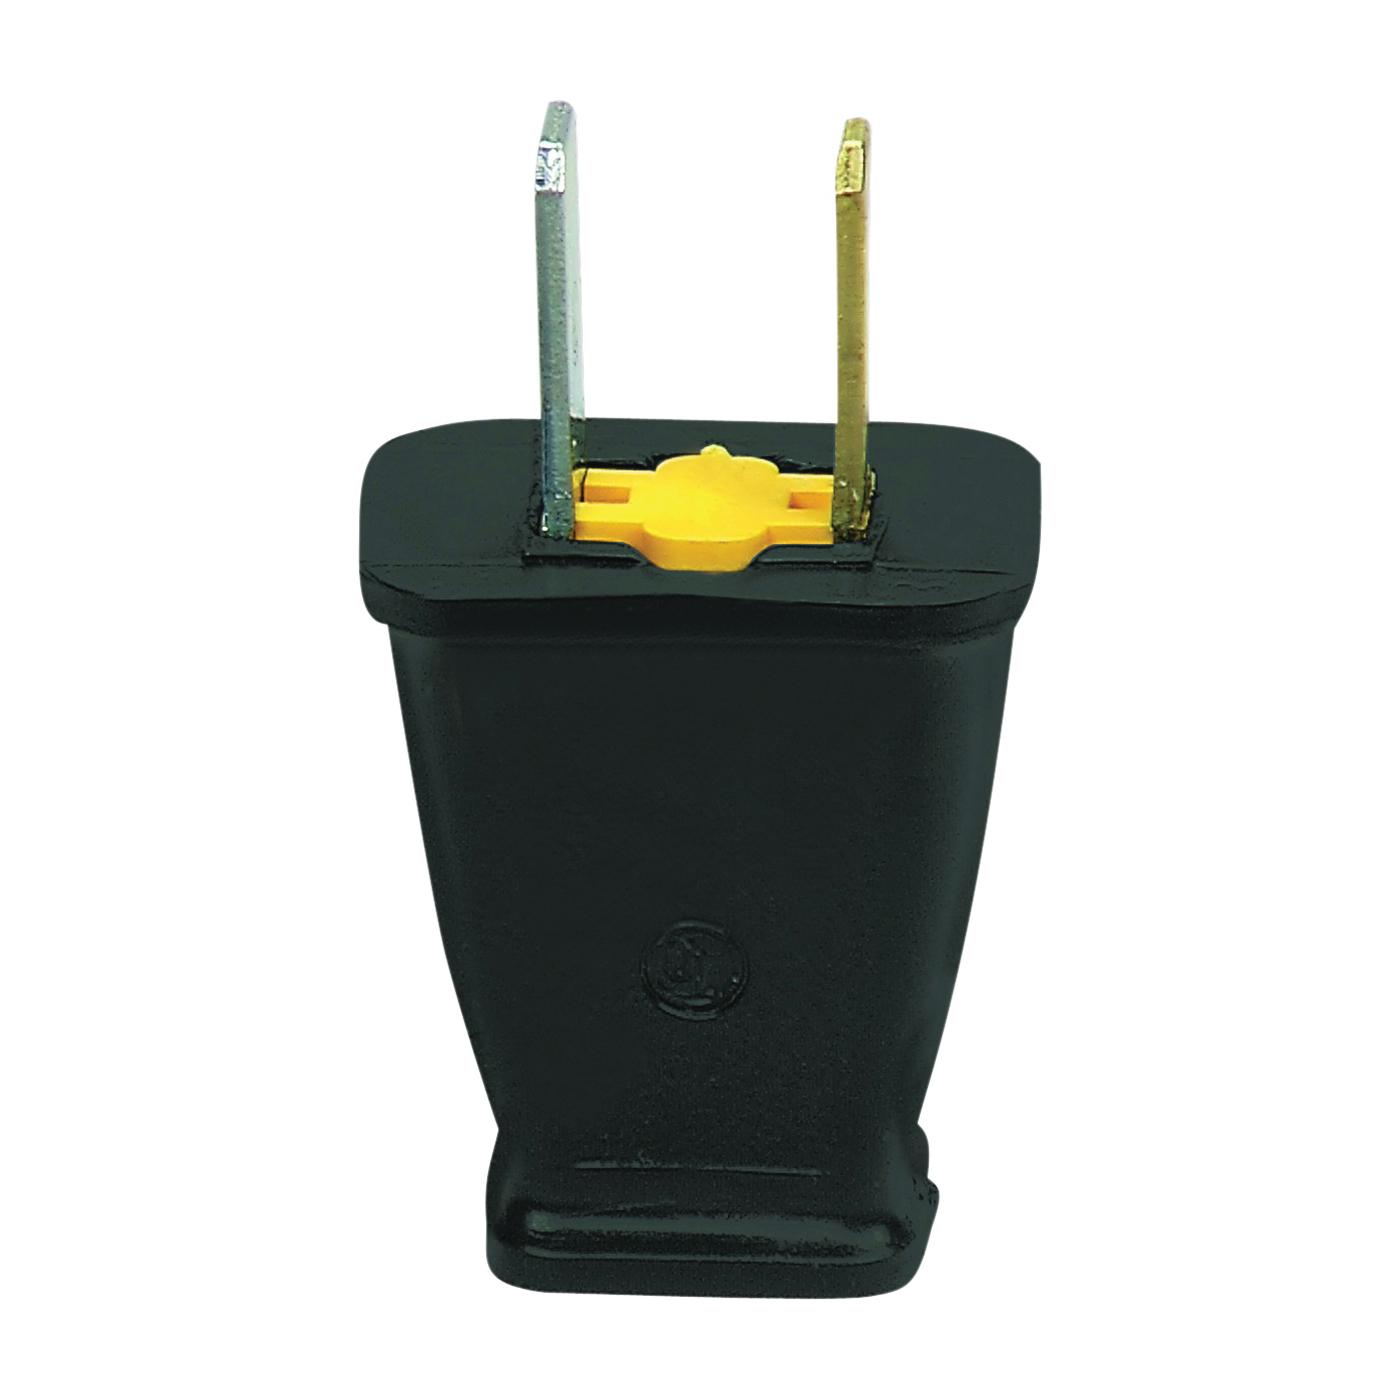 Eaton Wiring Devices SA540